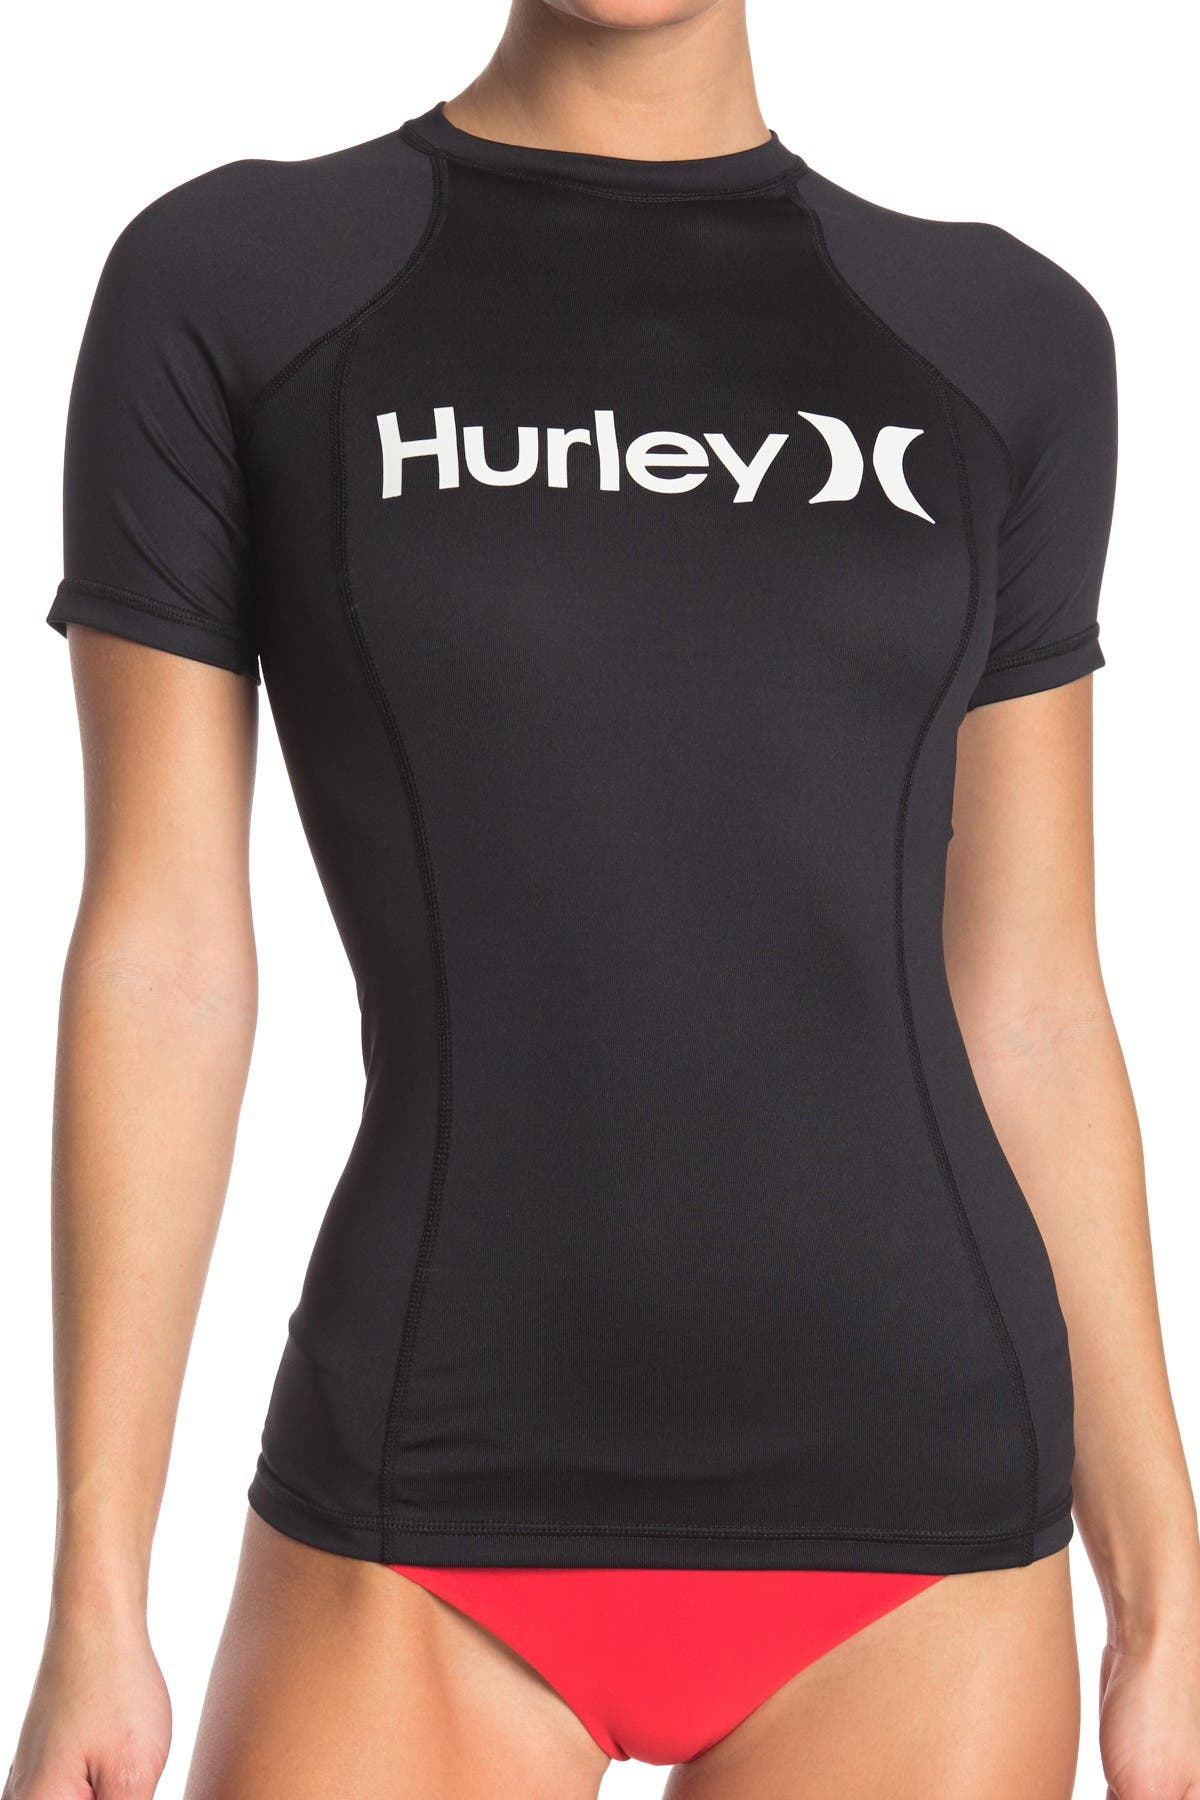 Image of Hurley One & Only Short Sleeve Rashguard